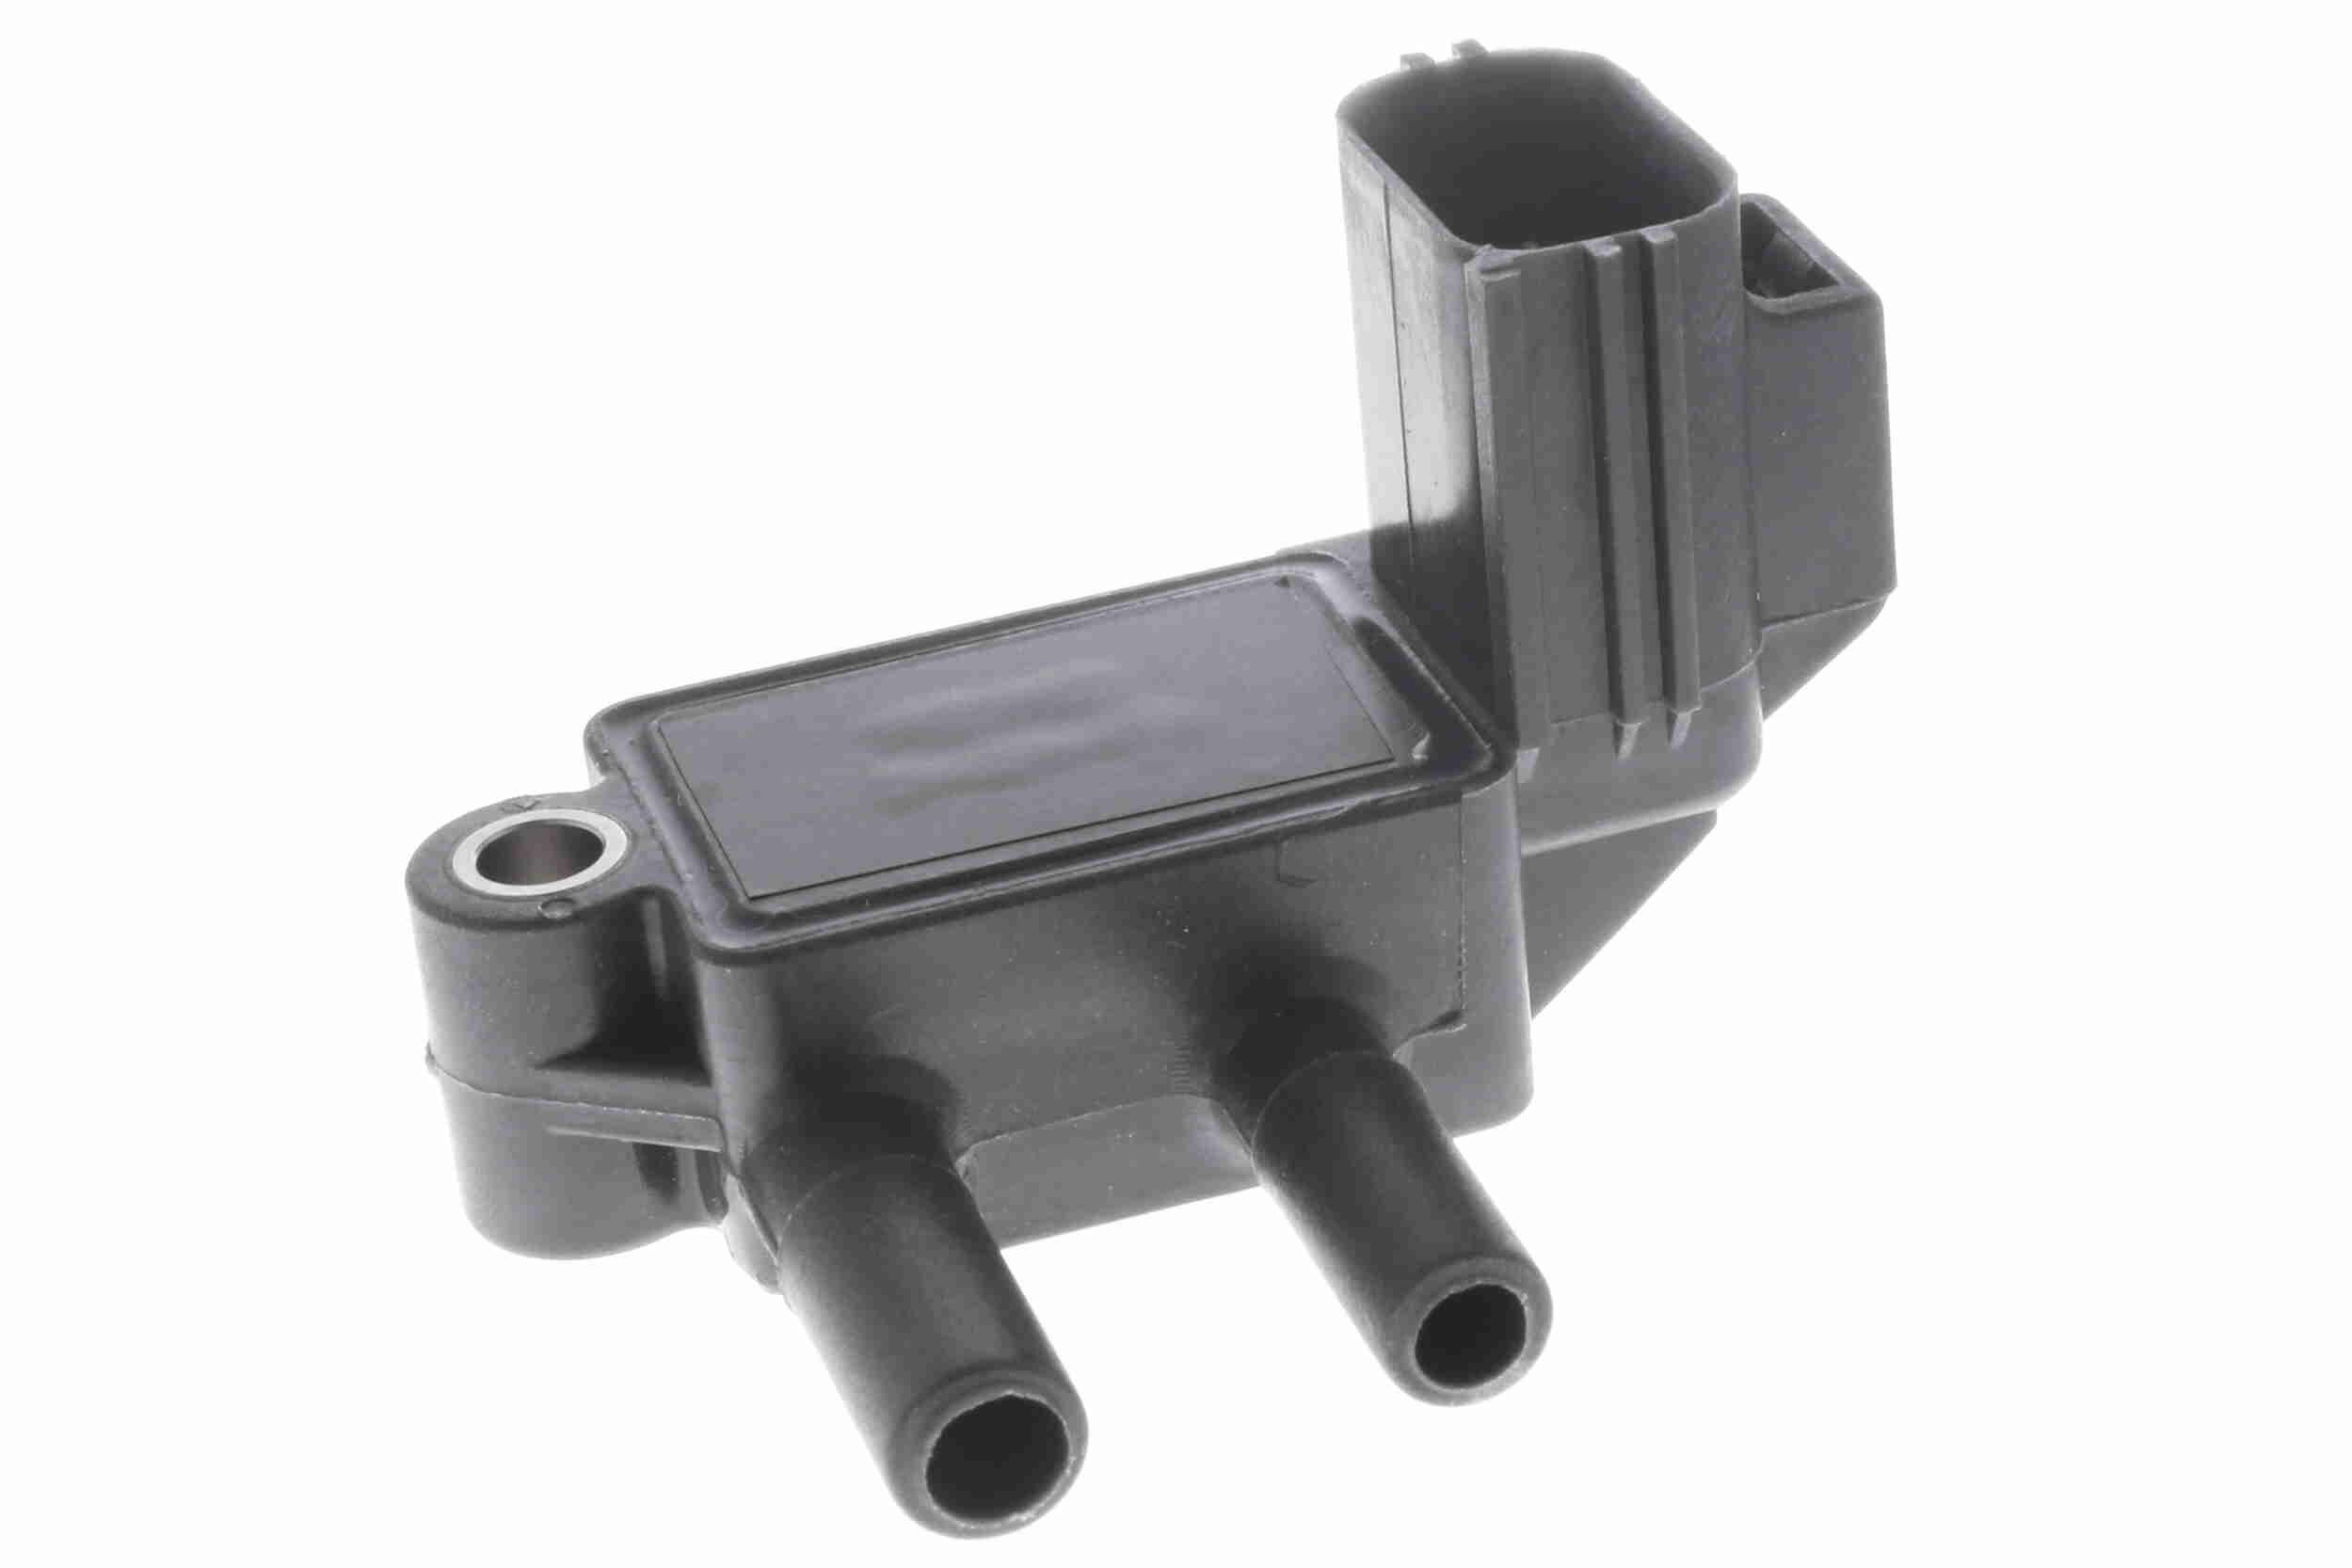 FORD FOCUS 2015 Abgasdrucksensor - Original VEMO V25-72-1238 Pol-Anzahl: 3-polig